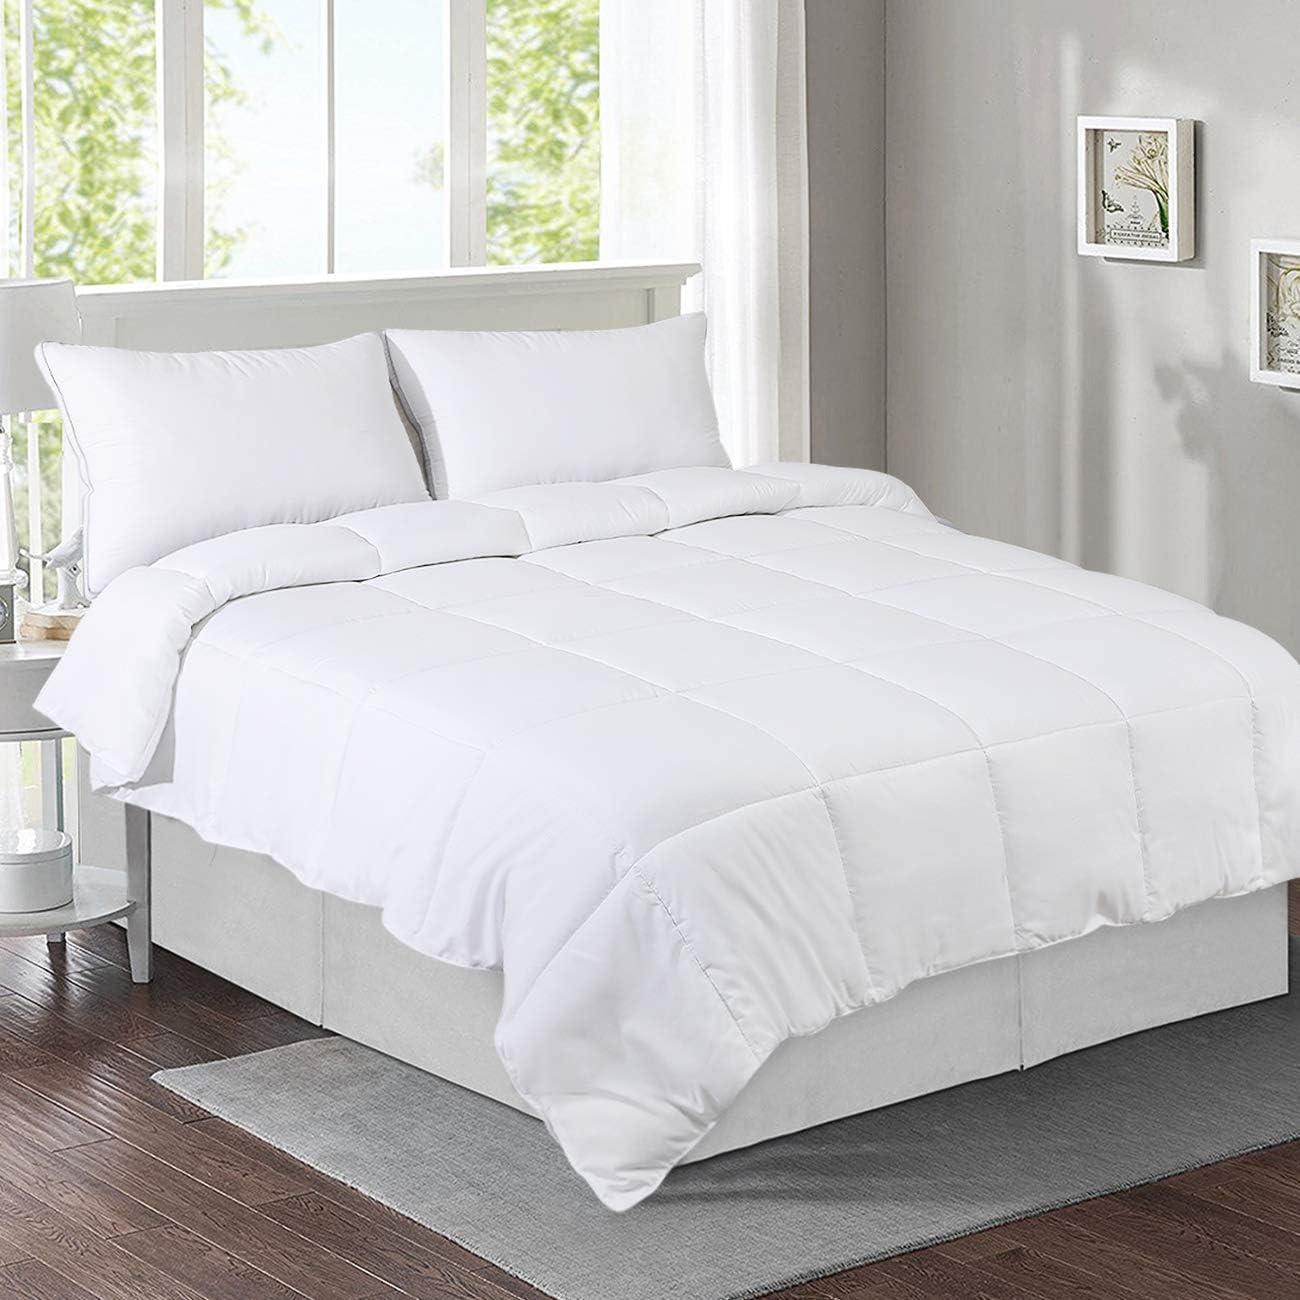 viewstar Queen Size Comforter, Lightweight Summer Cool Duvet Insert - All-Season White Down Alternative Quilted Comforters - Hypoallergenic - Machine Washable - Queen